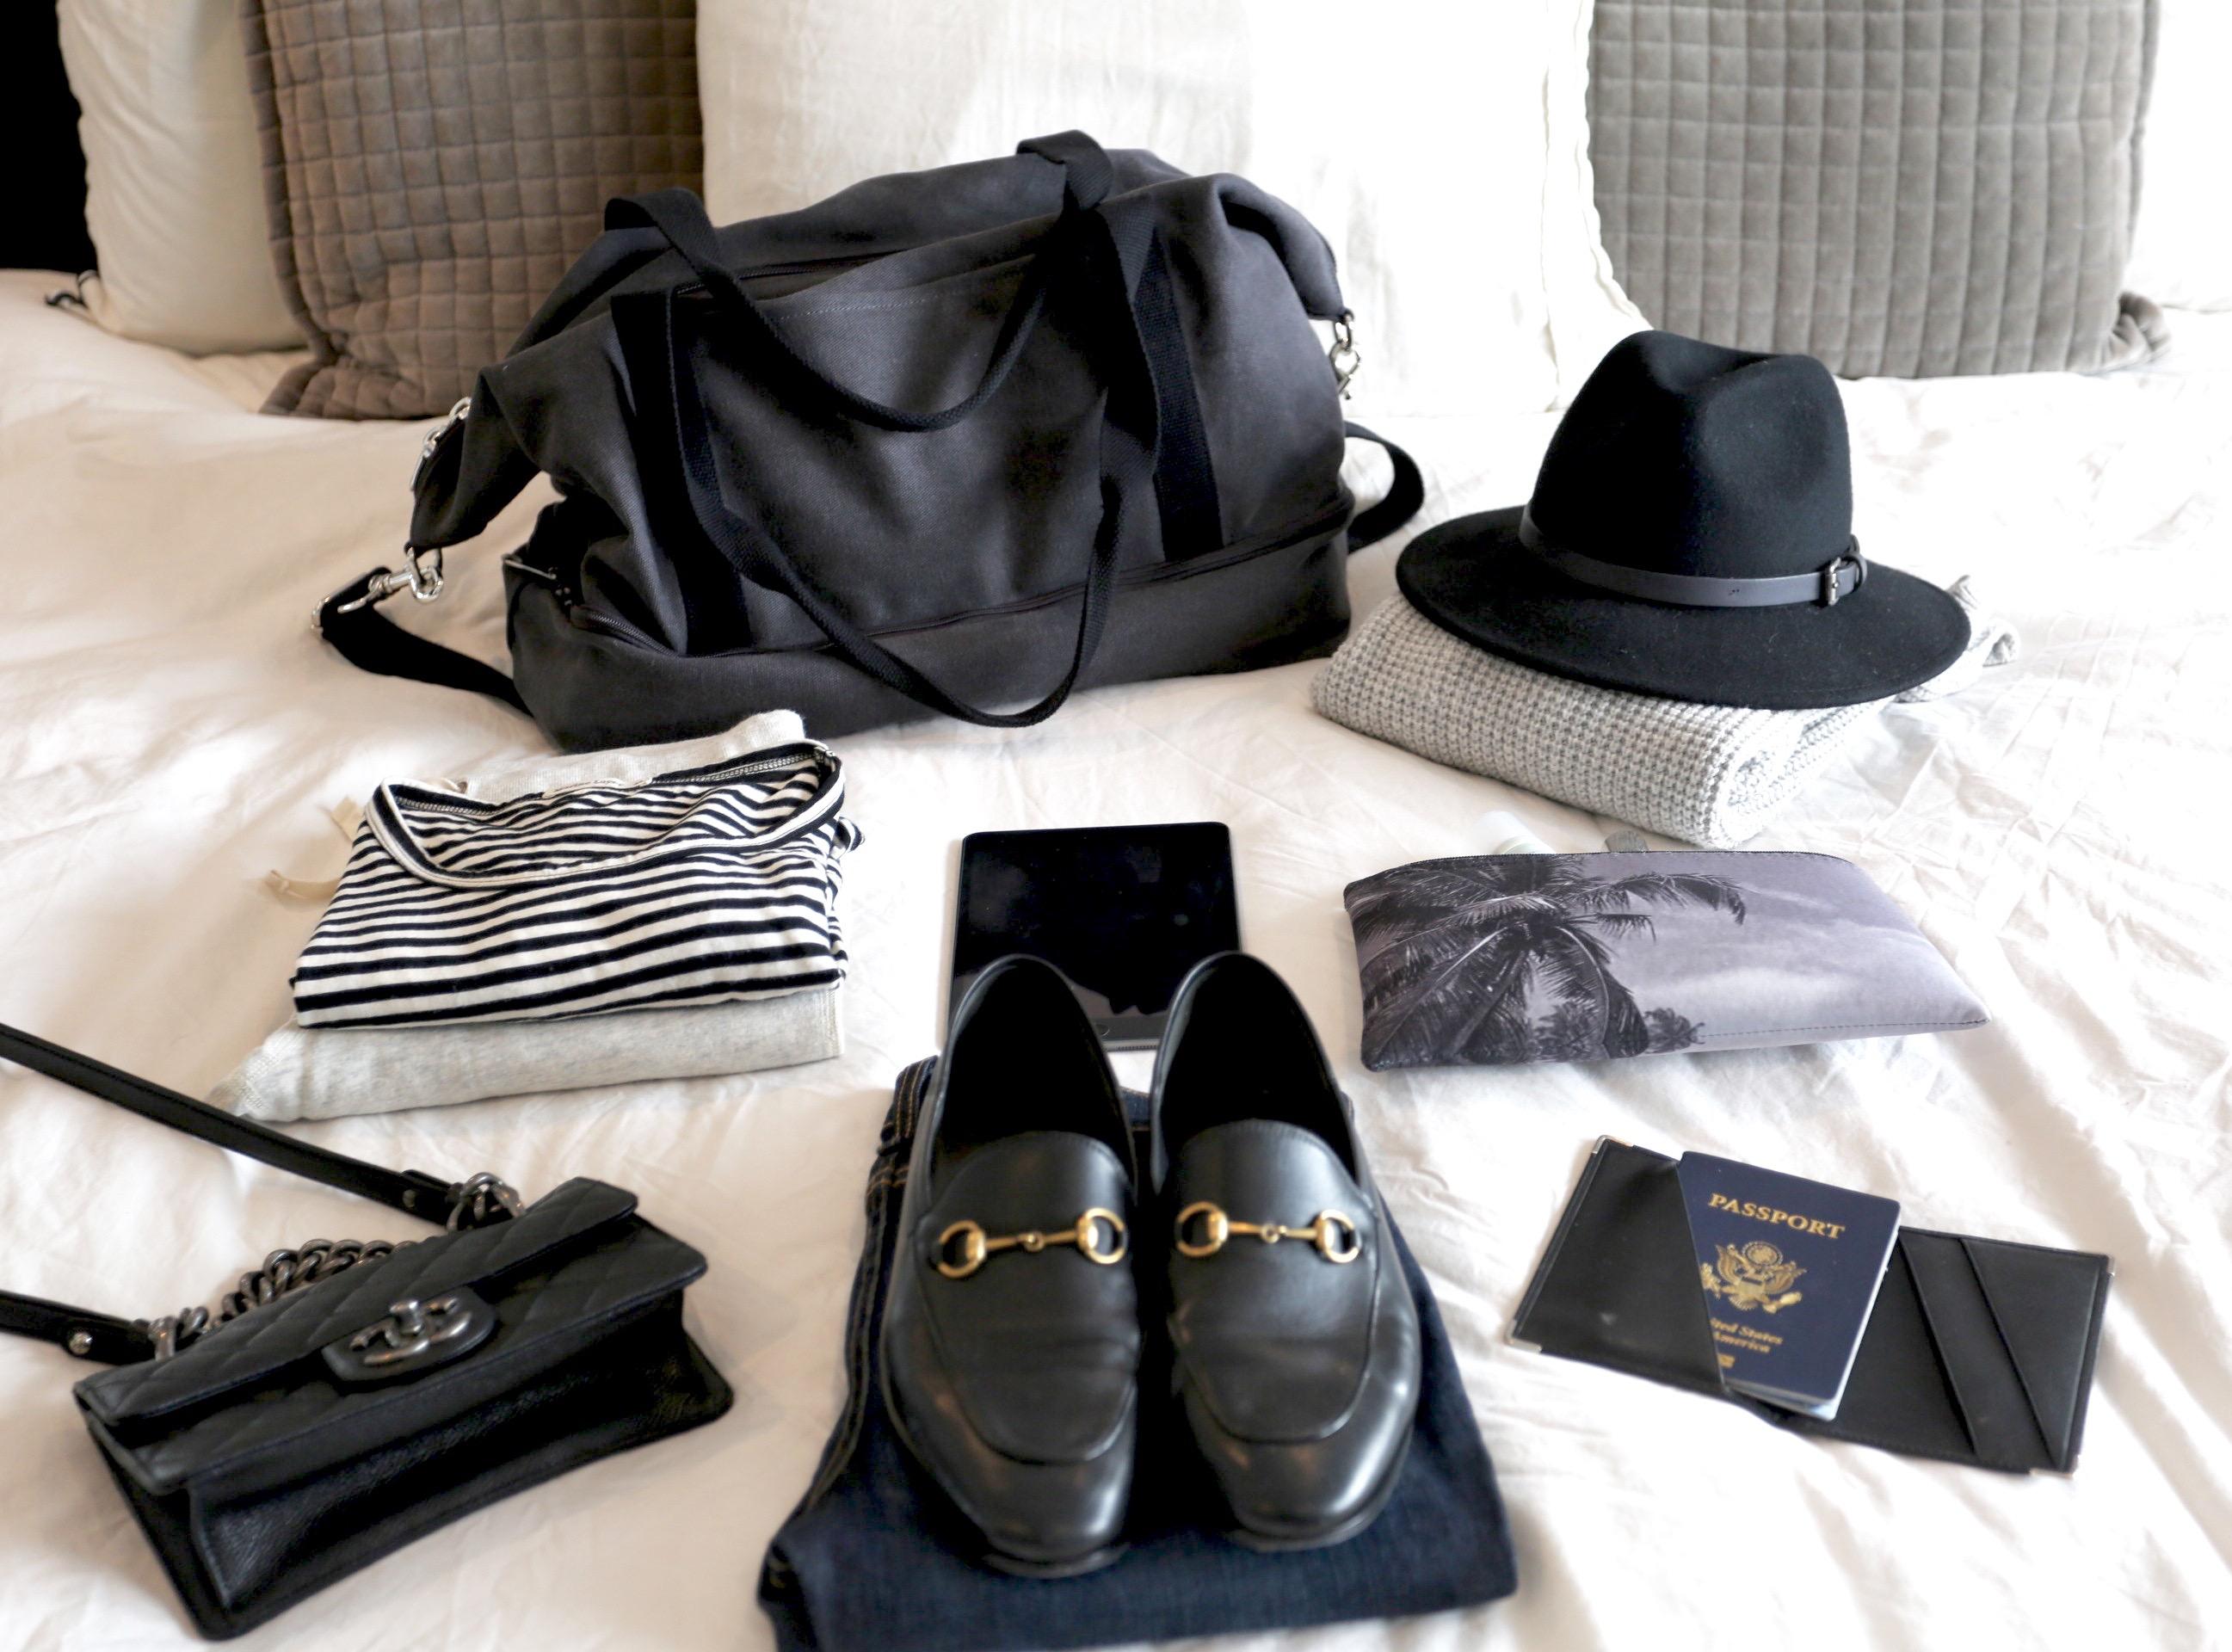 Lo Sons Travel Bag